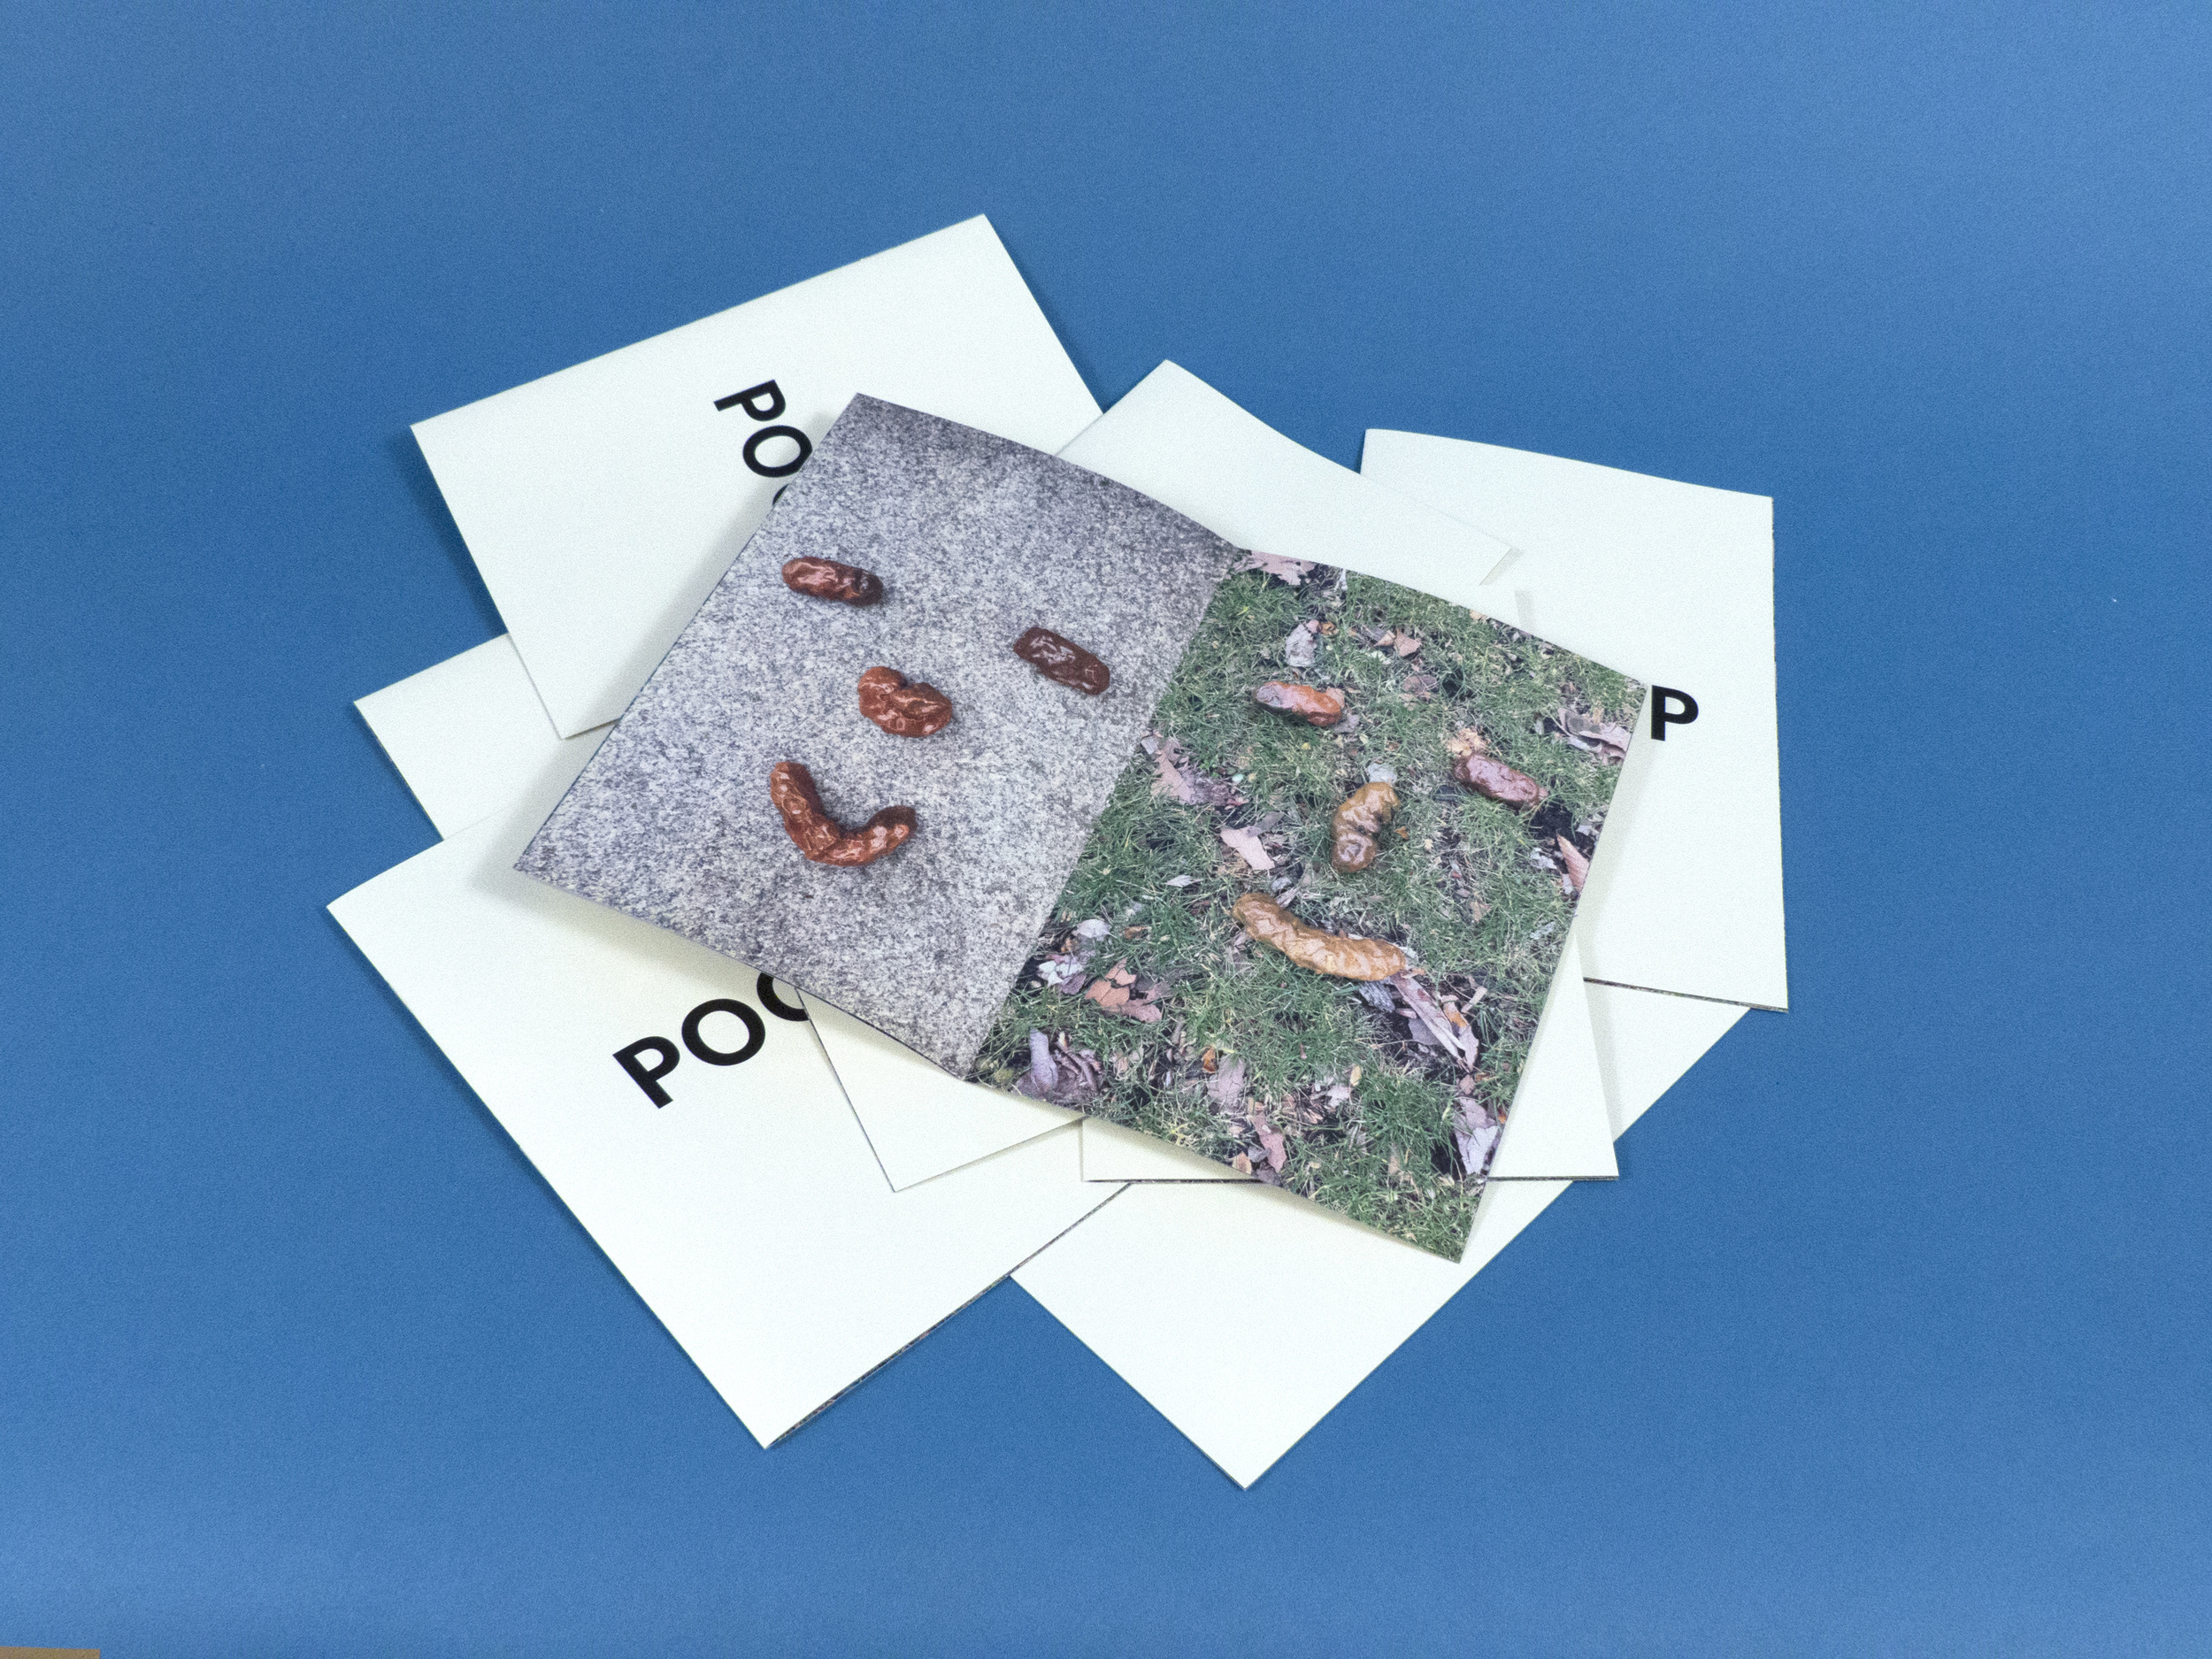 PoopZine_Photo_05.jpg